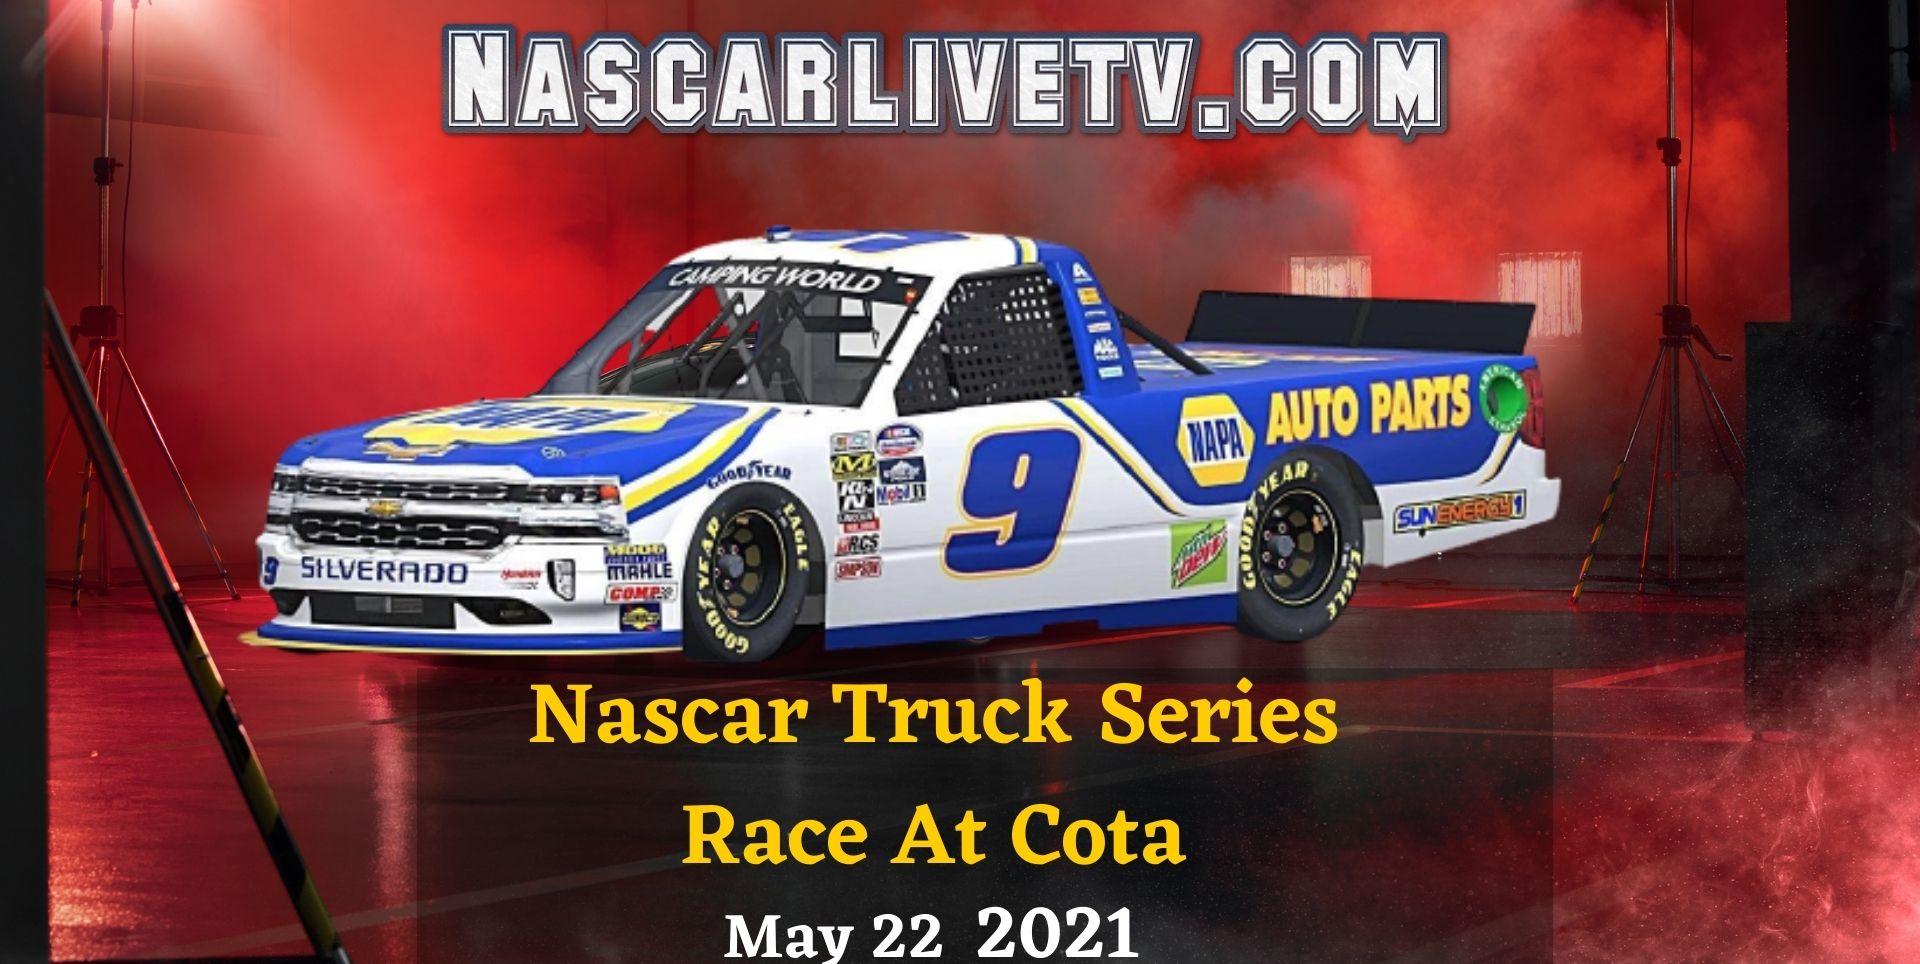 NASCAR Truck Series At Cota Live Stream